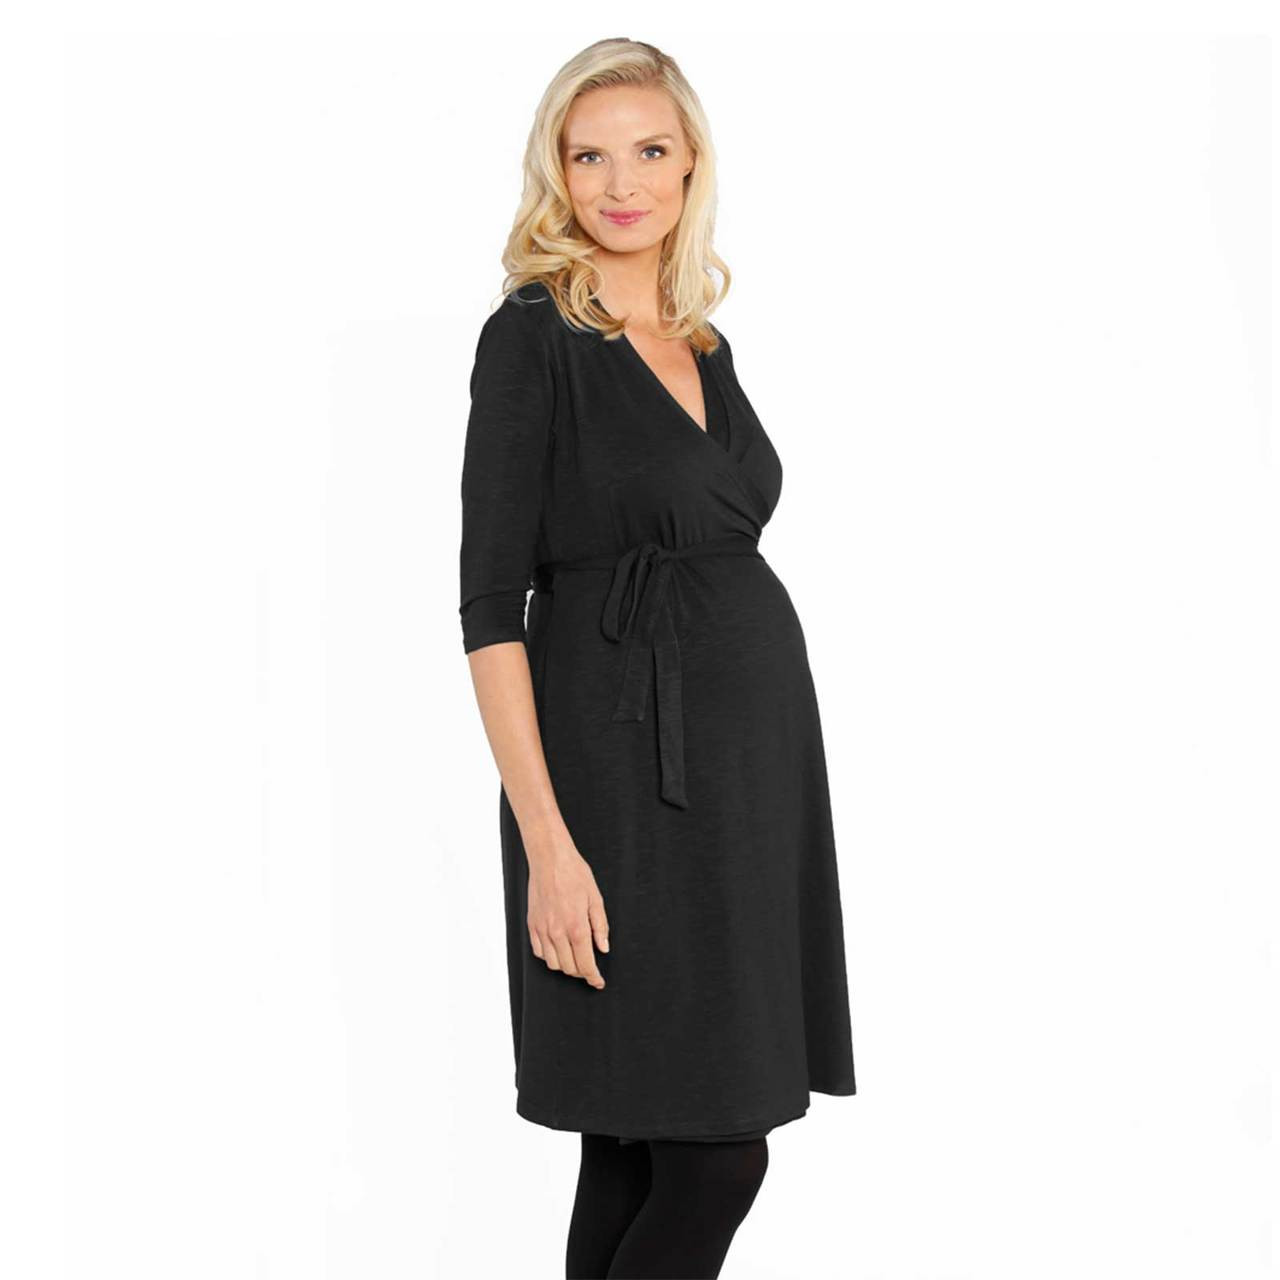 Angel maternity nursing wrap dress breastfeeding clothing online ombrellifo Images